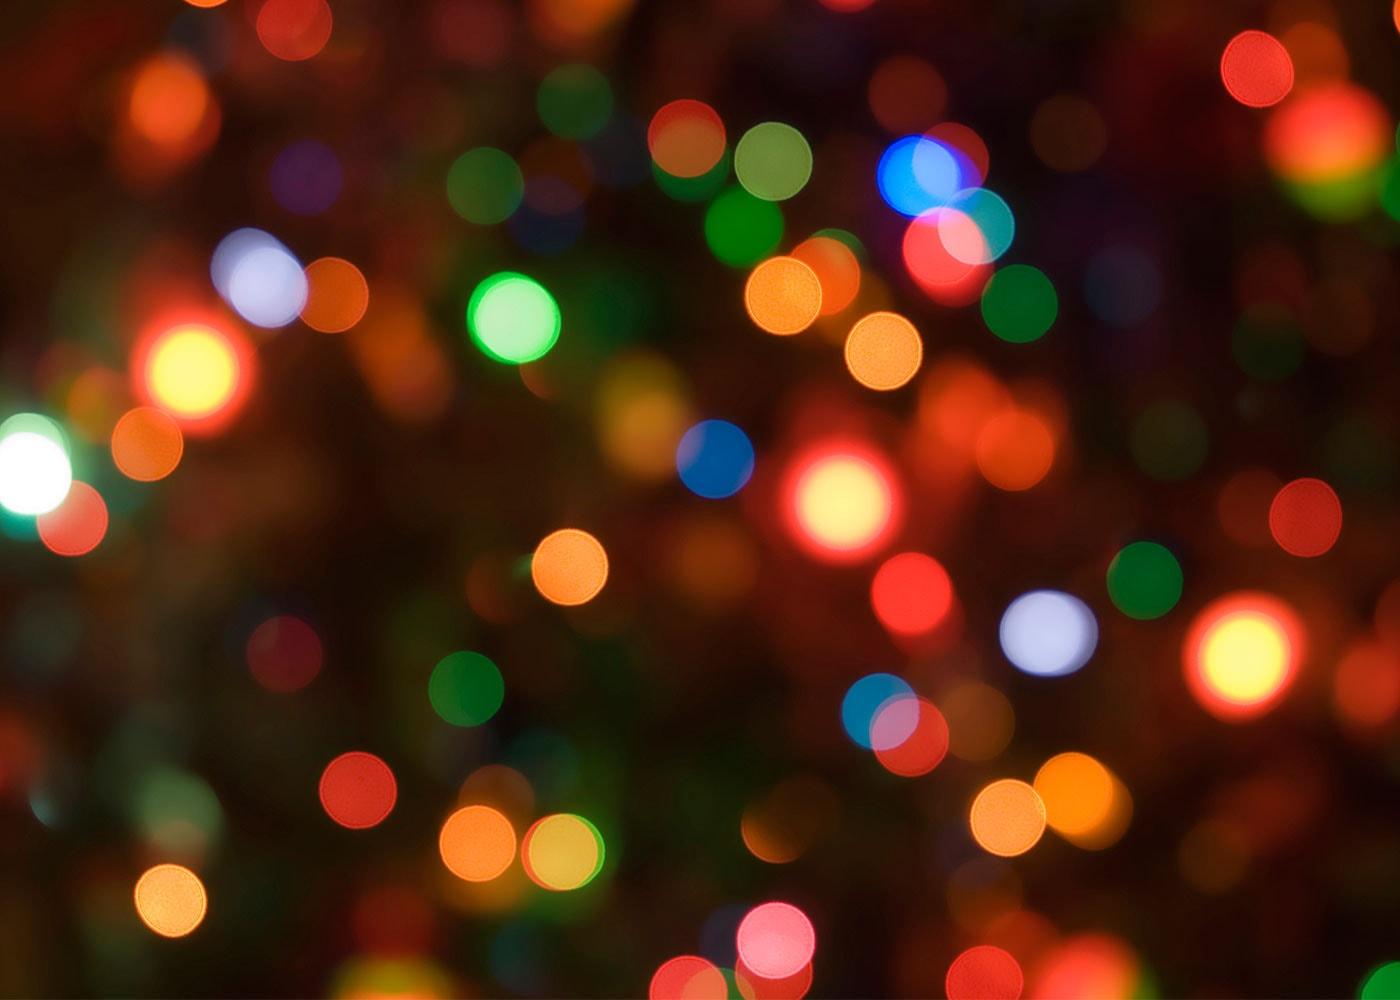 Großzügig Fehlerbehebung 3 Draht Weihnachtsbeleuchtung Ideen - Der ...